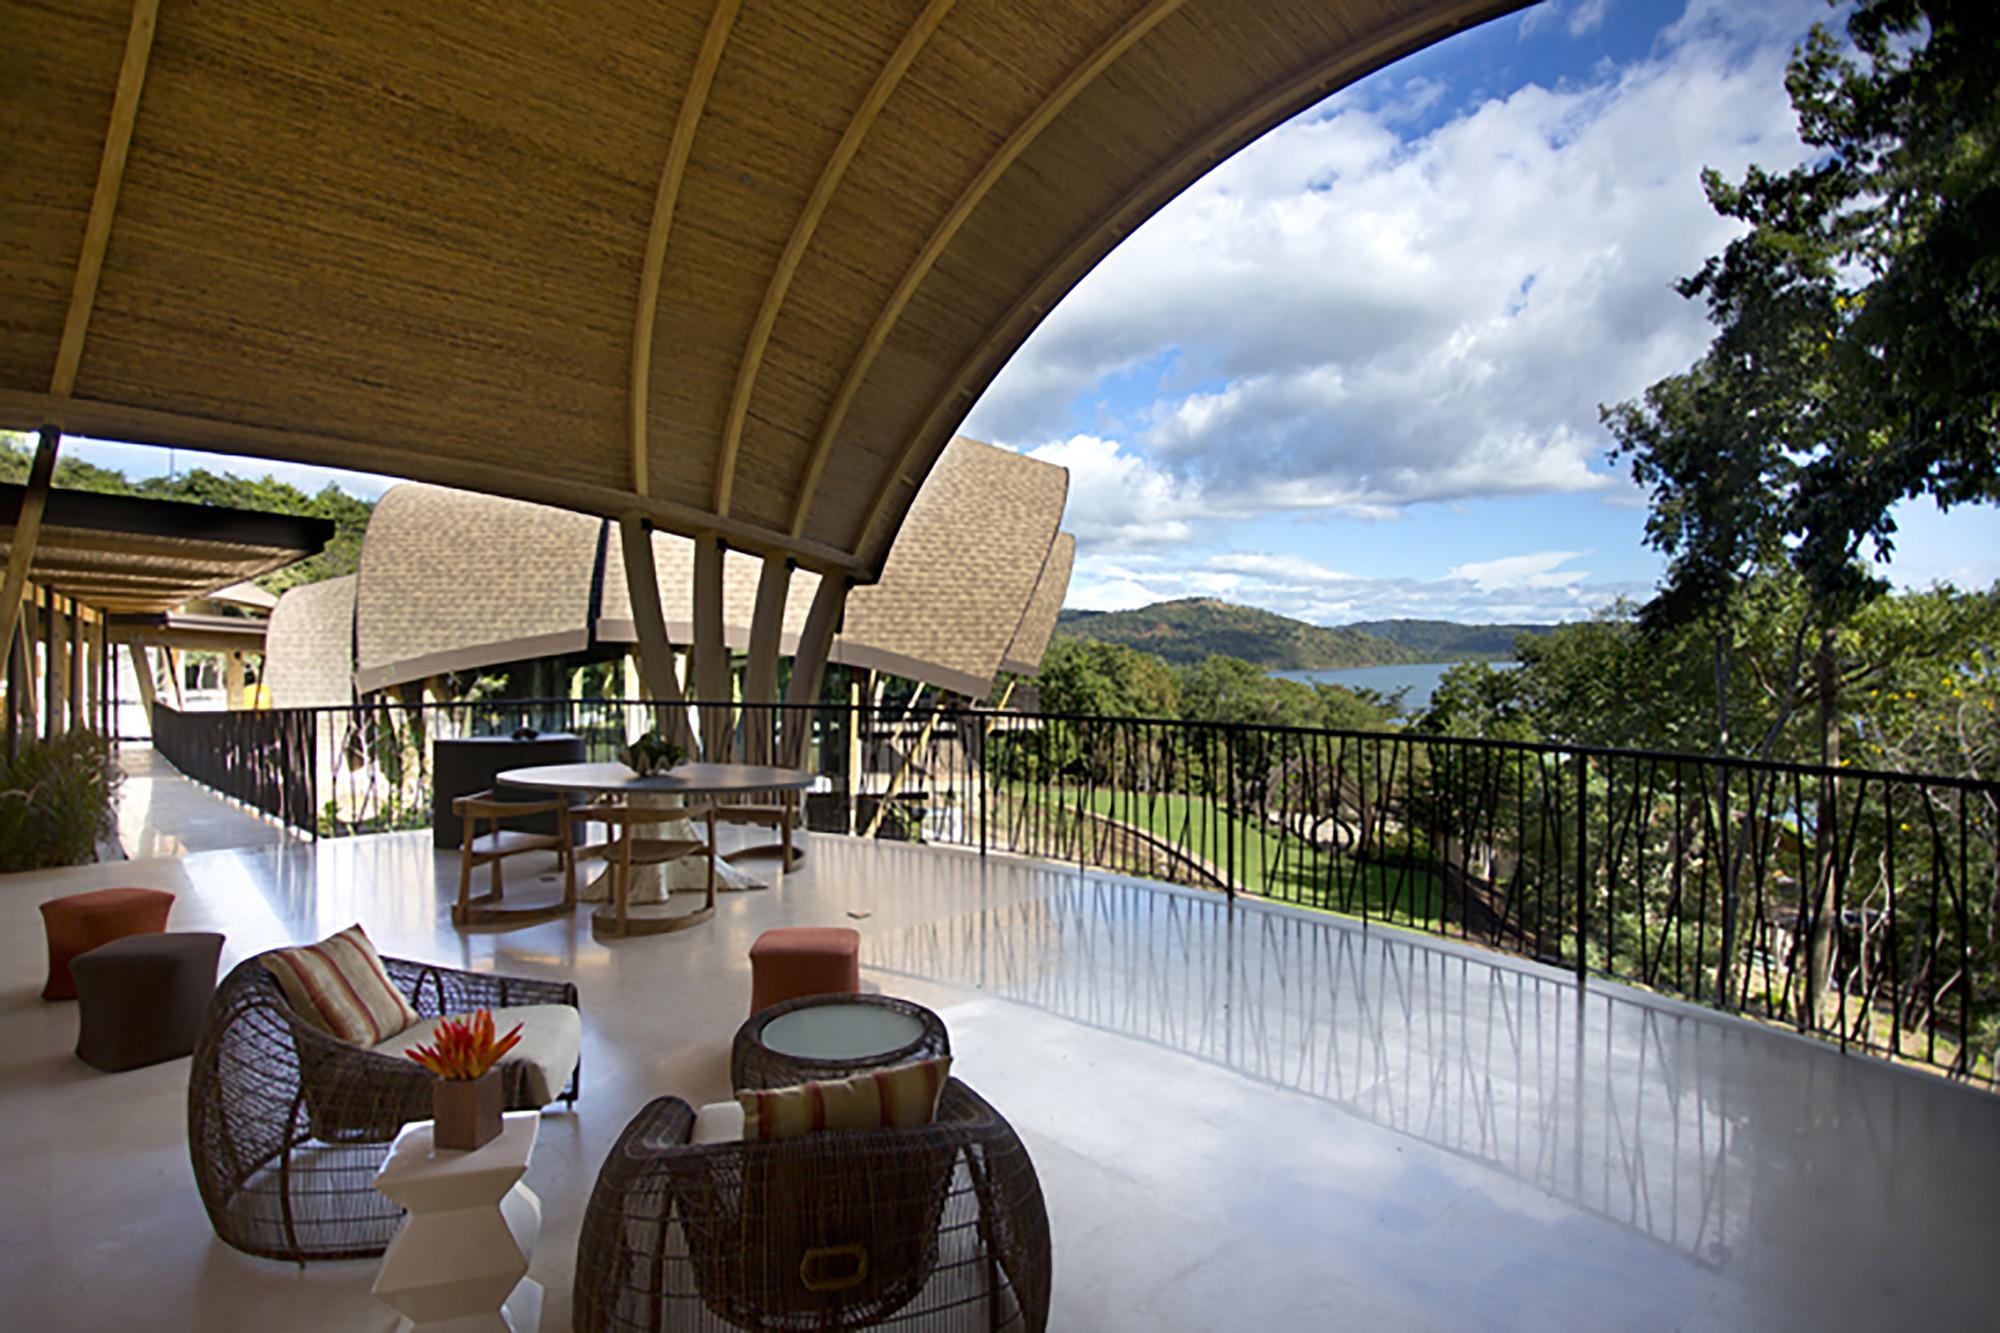 Gallery of andaz hotel z rcher arquitectos 9 for Arquitectos costa rica